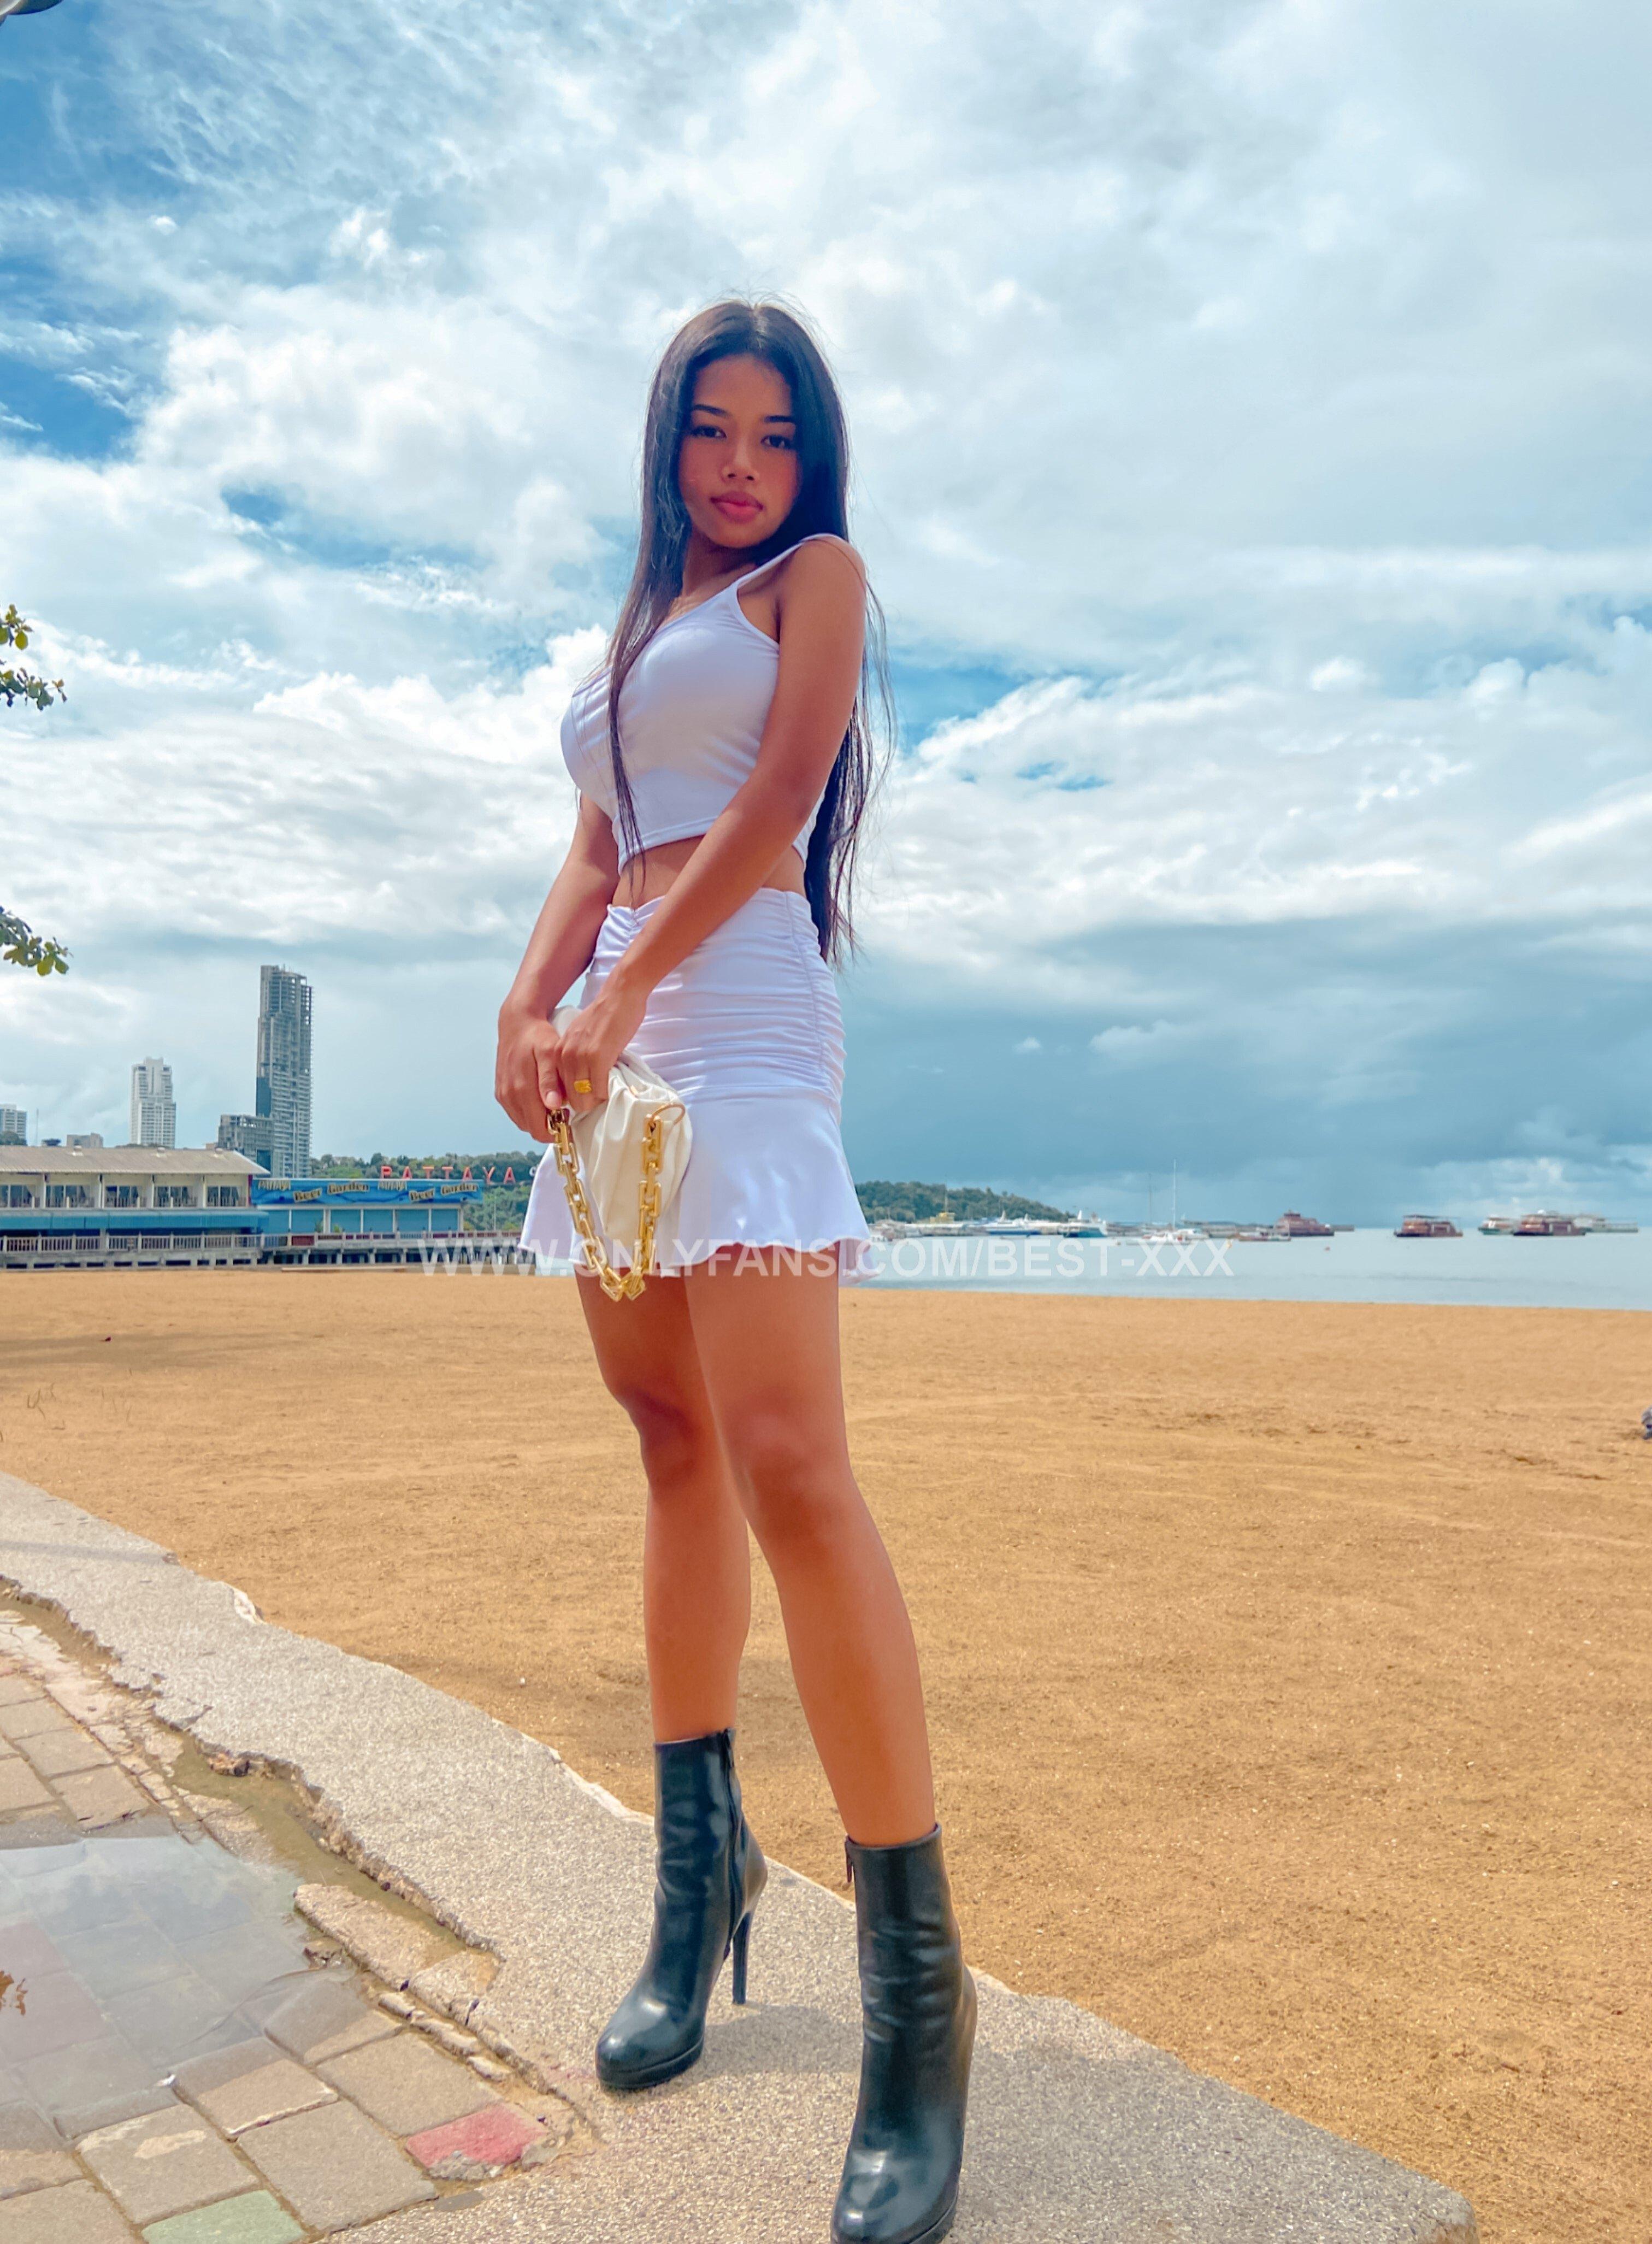 Mo Thai Pattaya Girl Leaked Onlyfans Best Xxx 0165